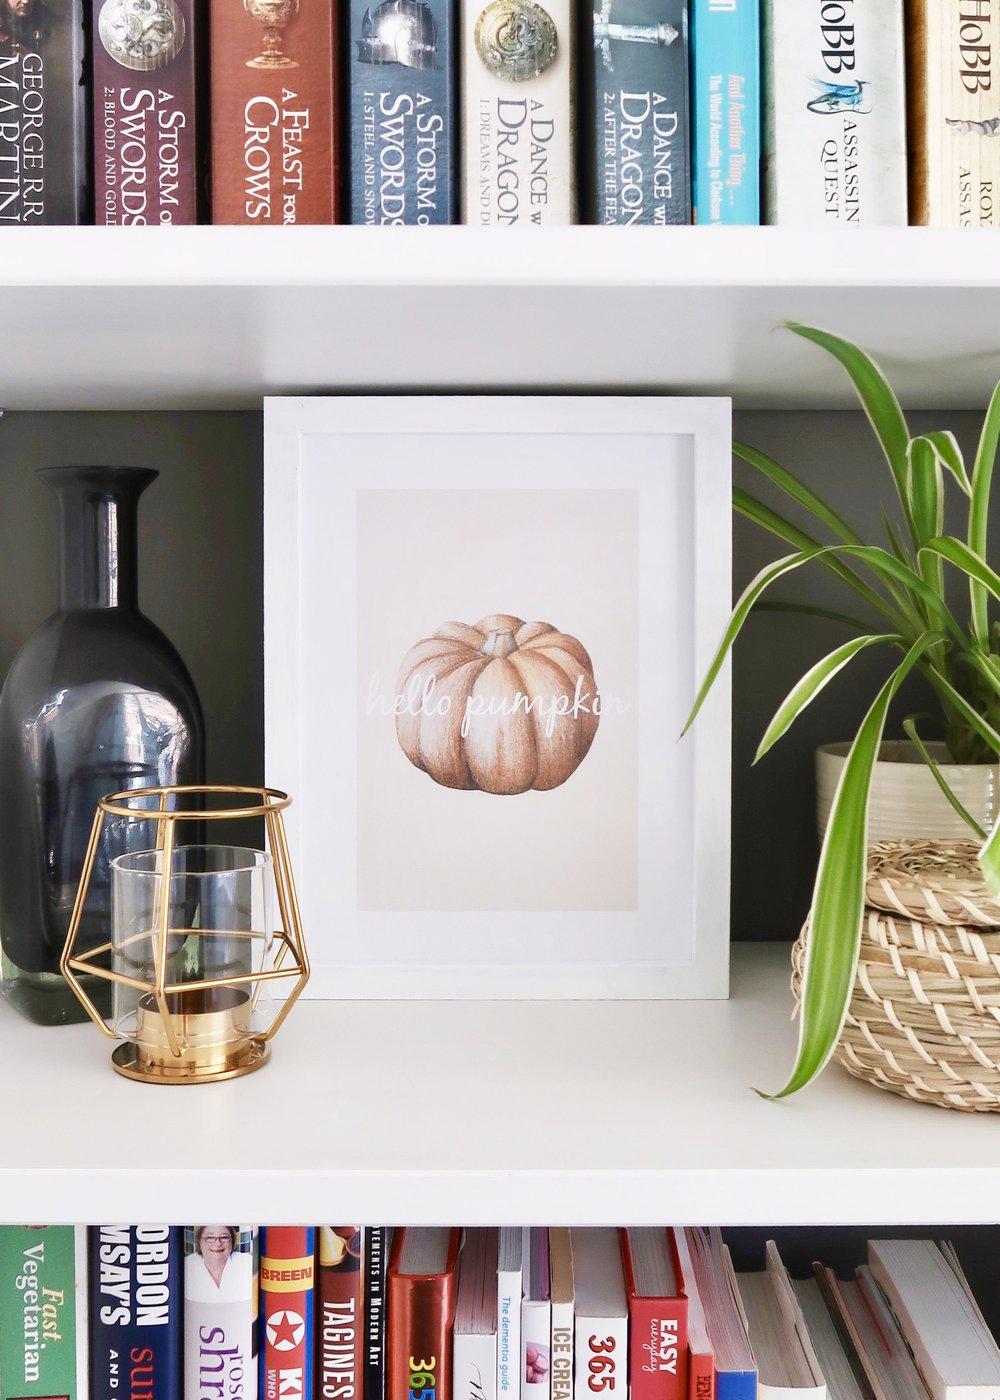 Printable Pumpkin Wall Art by Isoscella